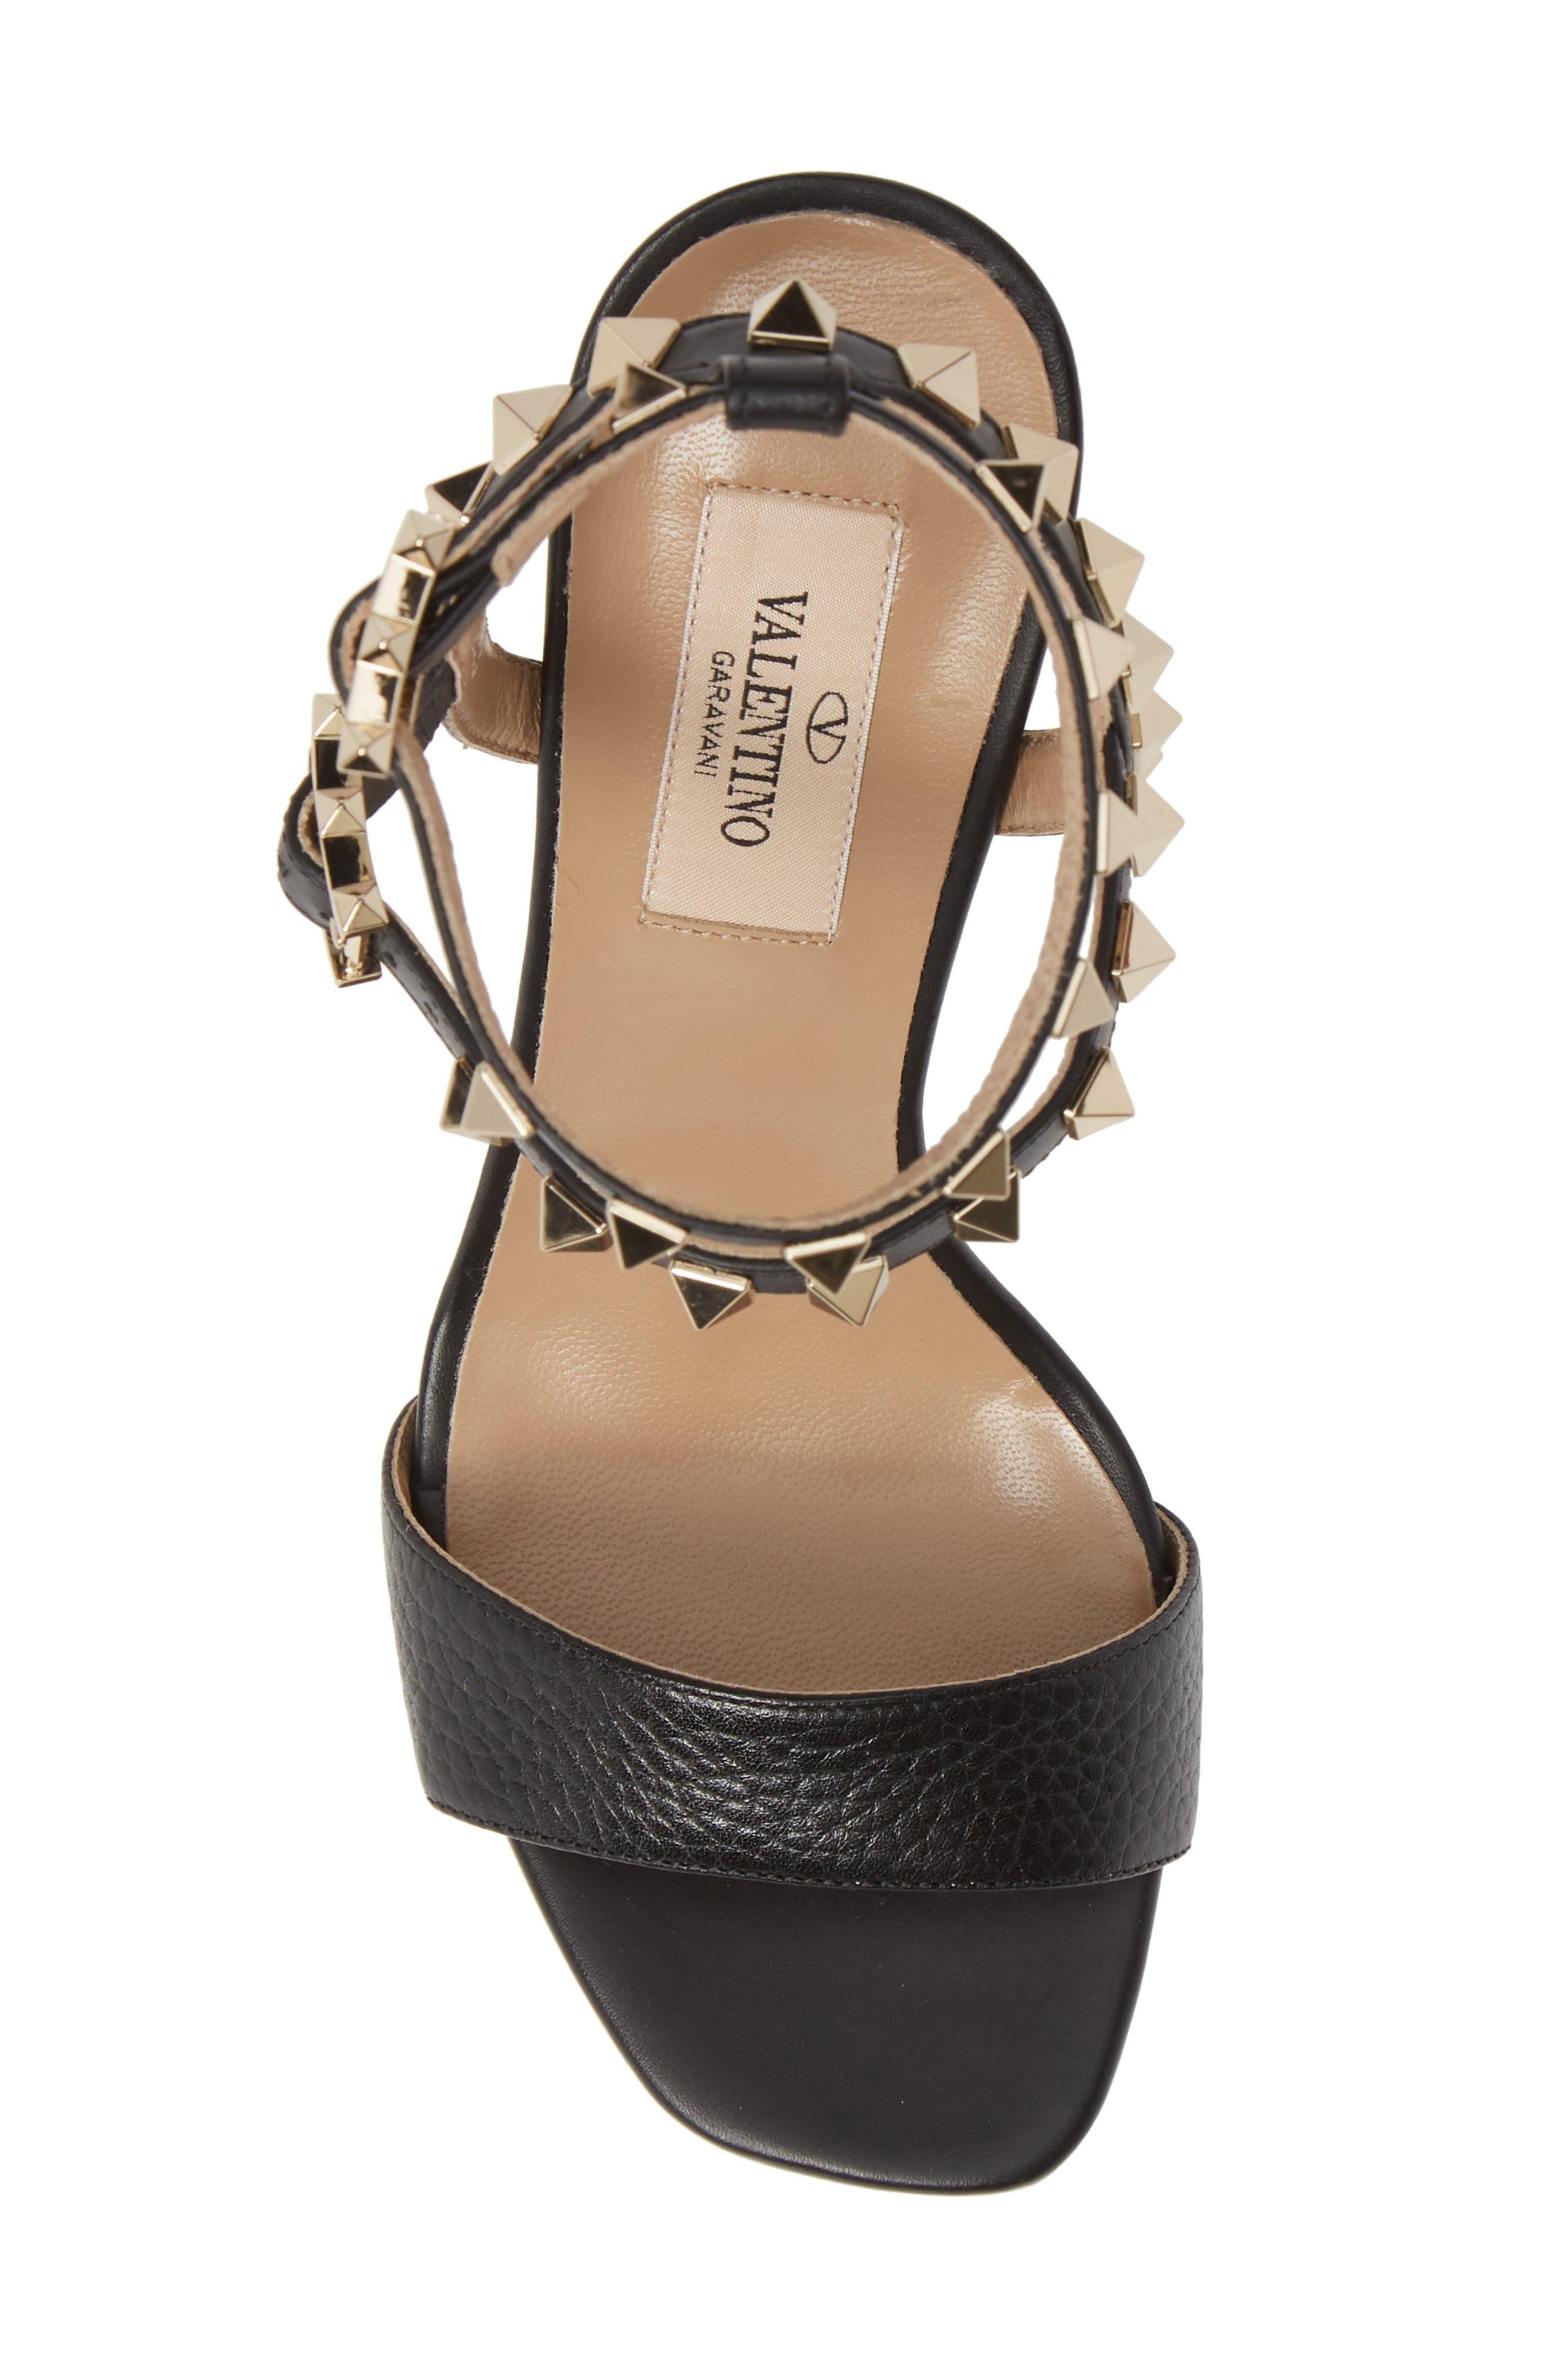 VALENTINO GARAVANI, Rockstud Ankle Strap Block Sandal, Alternate thumbnail 5, color, BLACK/ BLACK